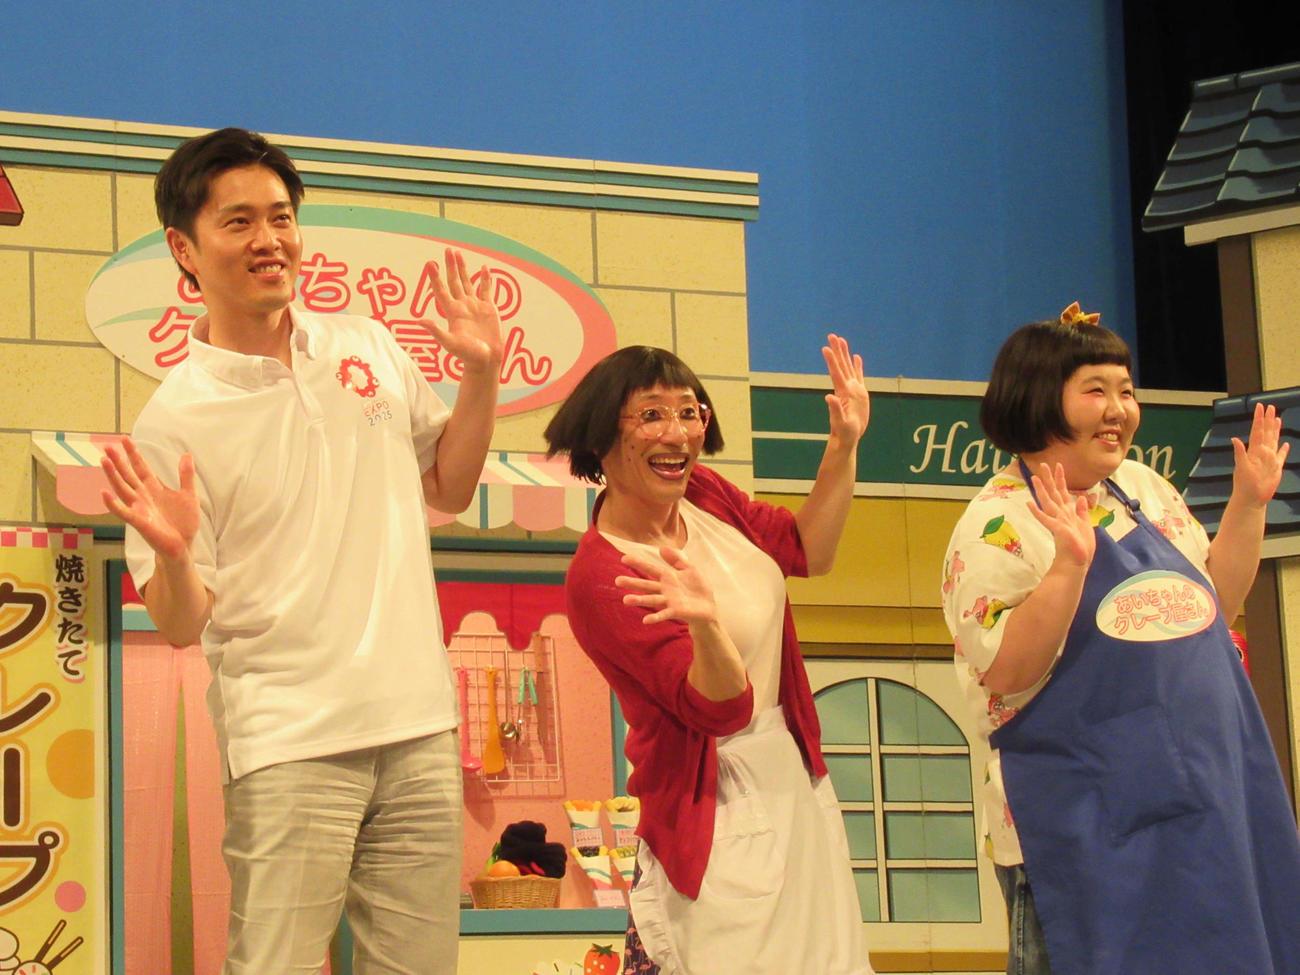 「SDGs新喜劇」の取材会でポーズを決める左から吉村洋文知事、すっちー、酒井藍(撮影・星名希実)